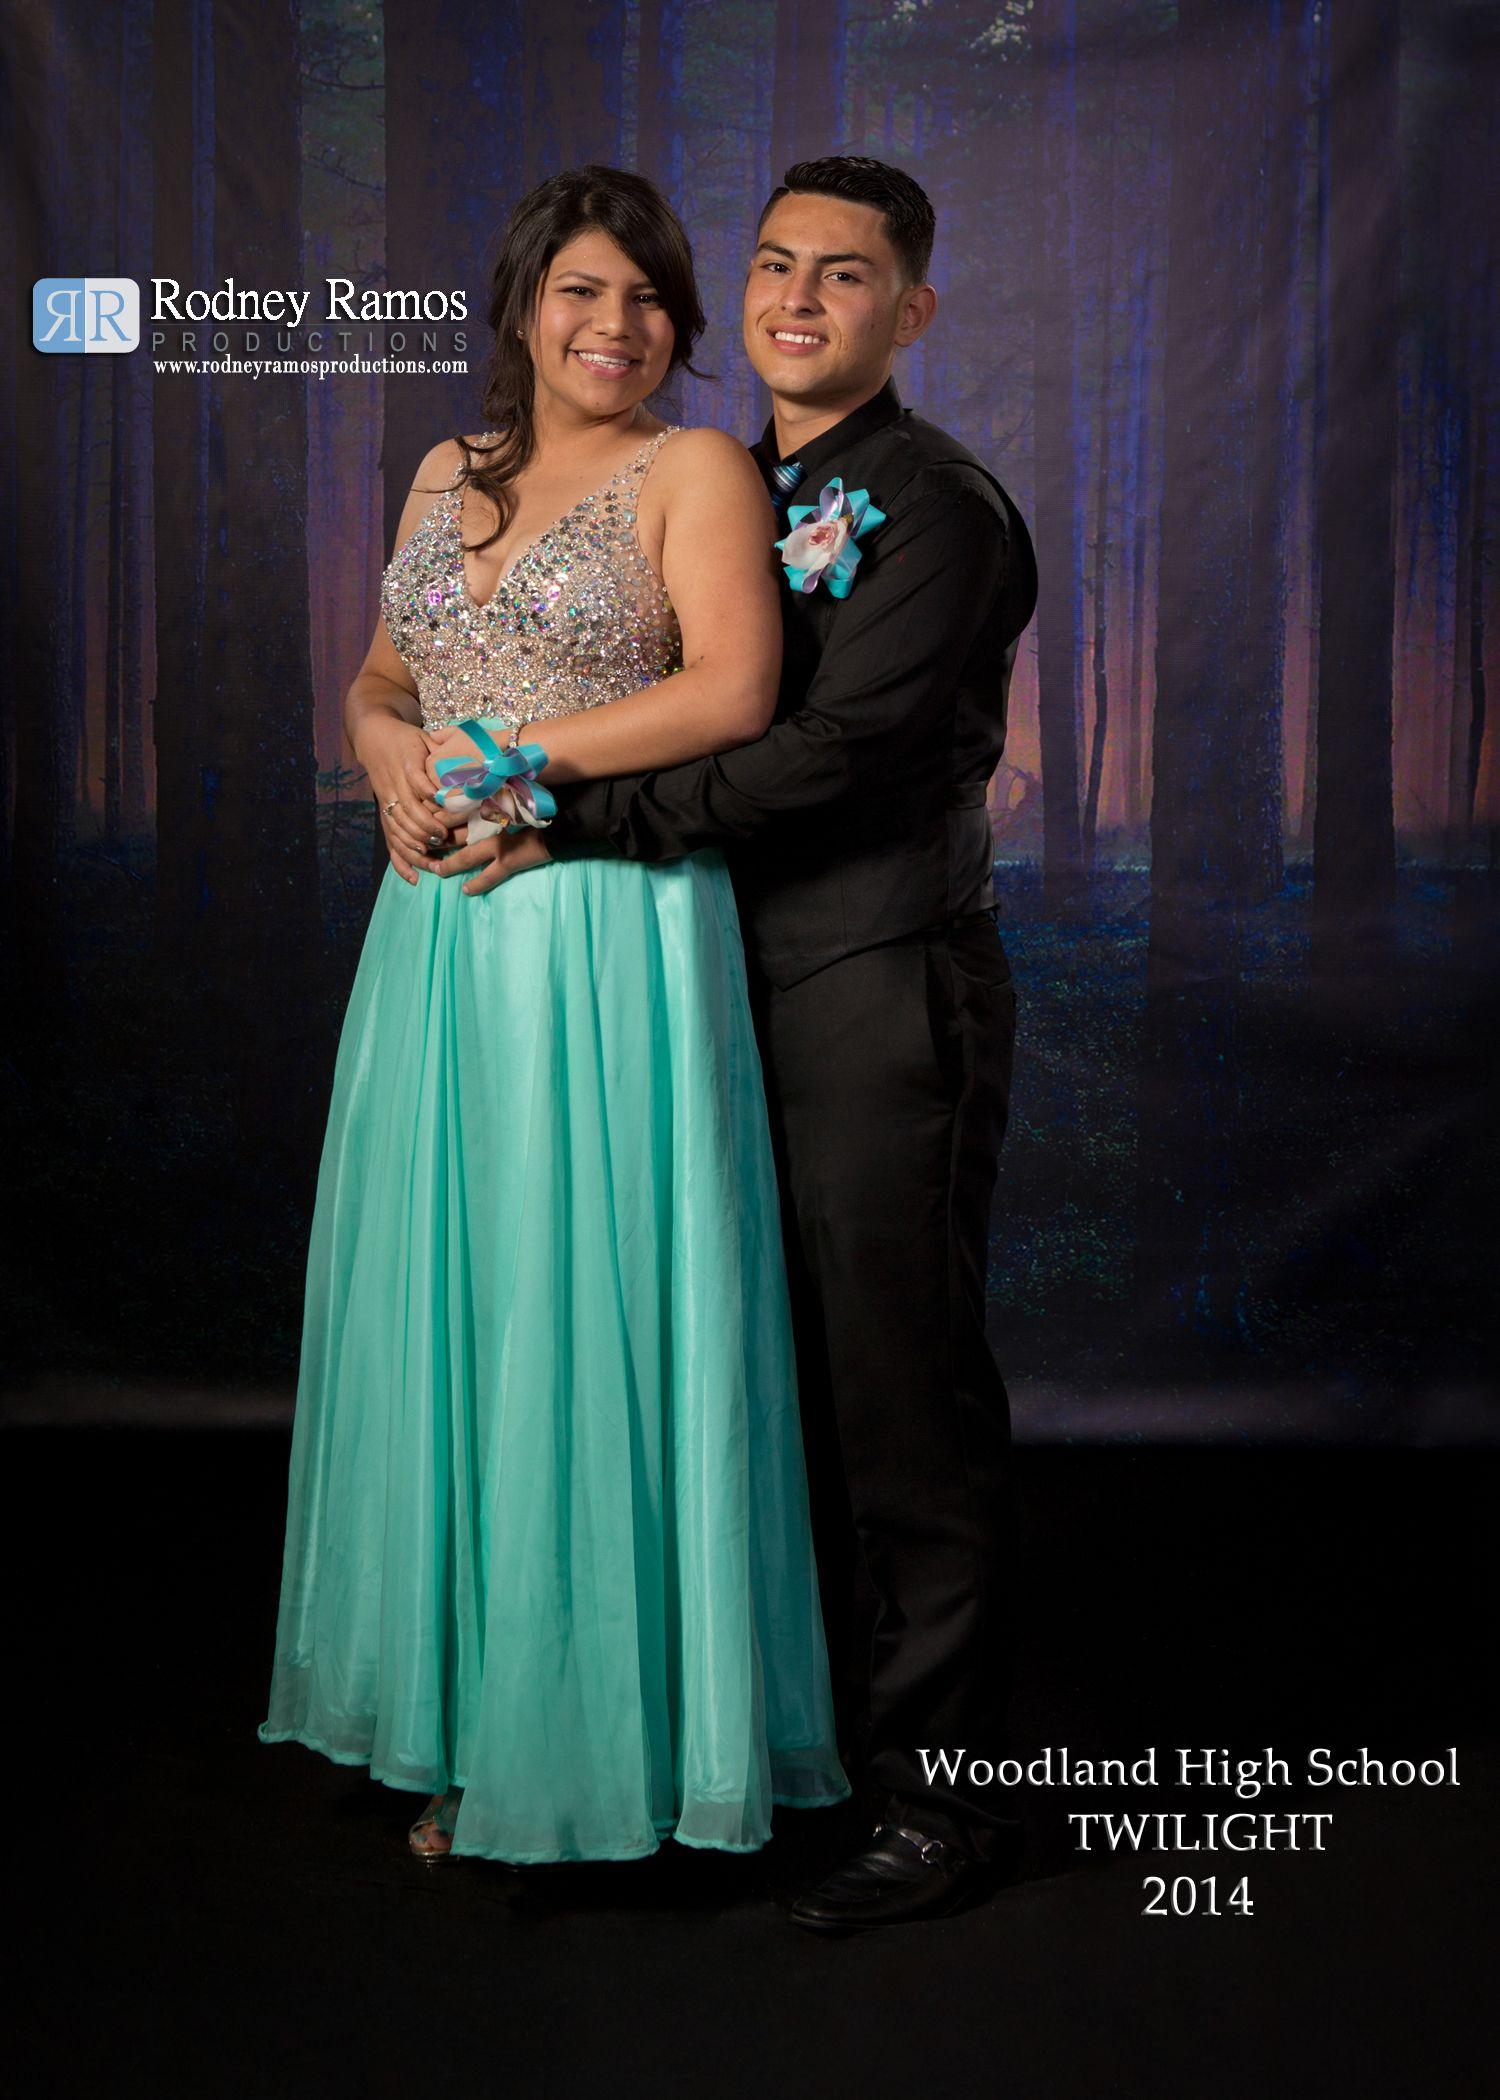 Woodland High School 2014 Twilight Prom Photo Styling By Rodney Ramos Productions C 2014 Rodneyramosproductions Rodneyramos Whs Woo Prom Photos Prom Fashion [ 2100 x 1500 Pixel ]